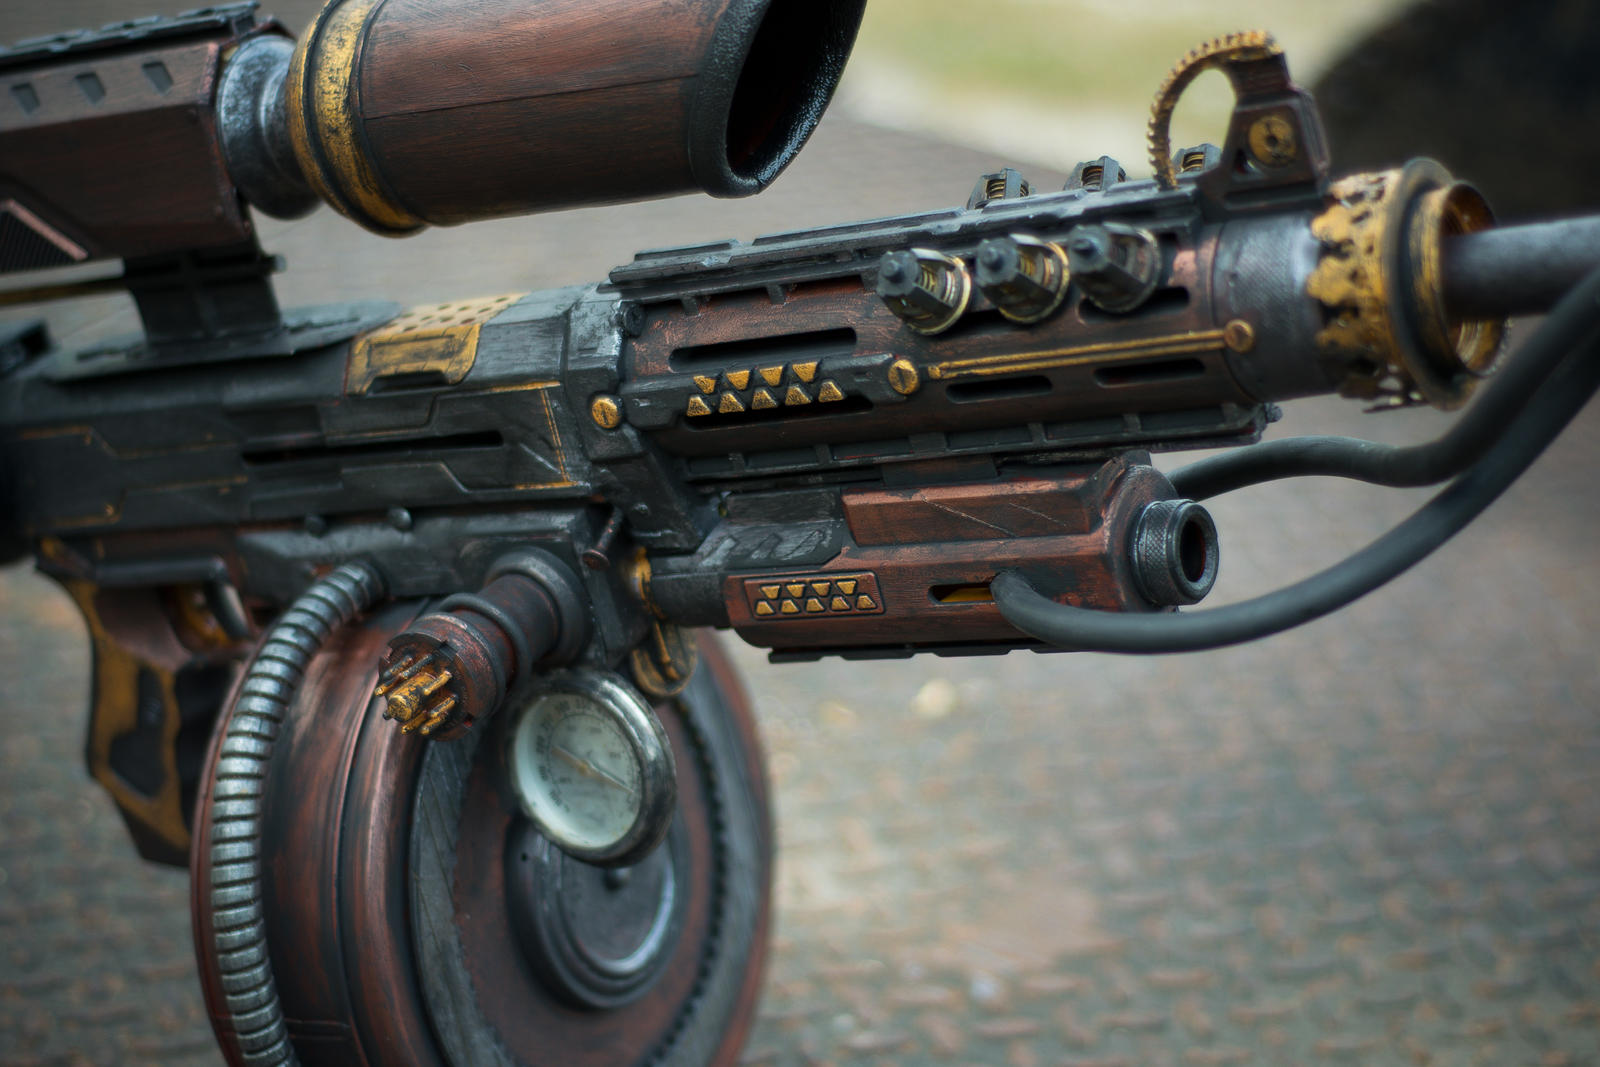 the machine sniper rifle